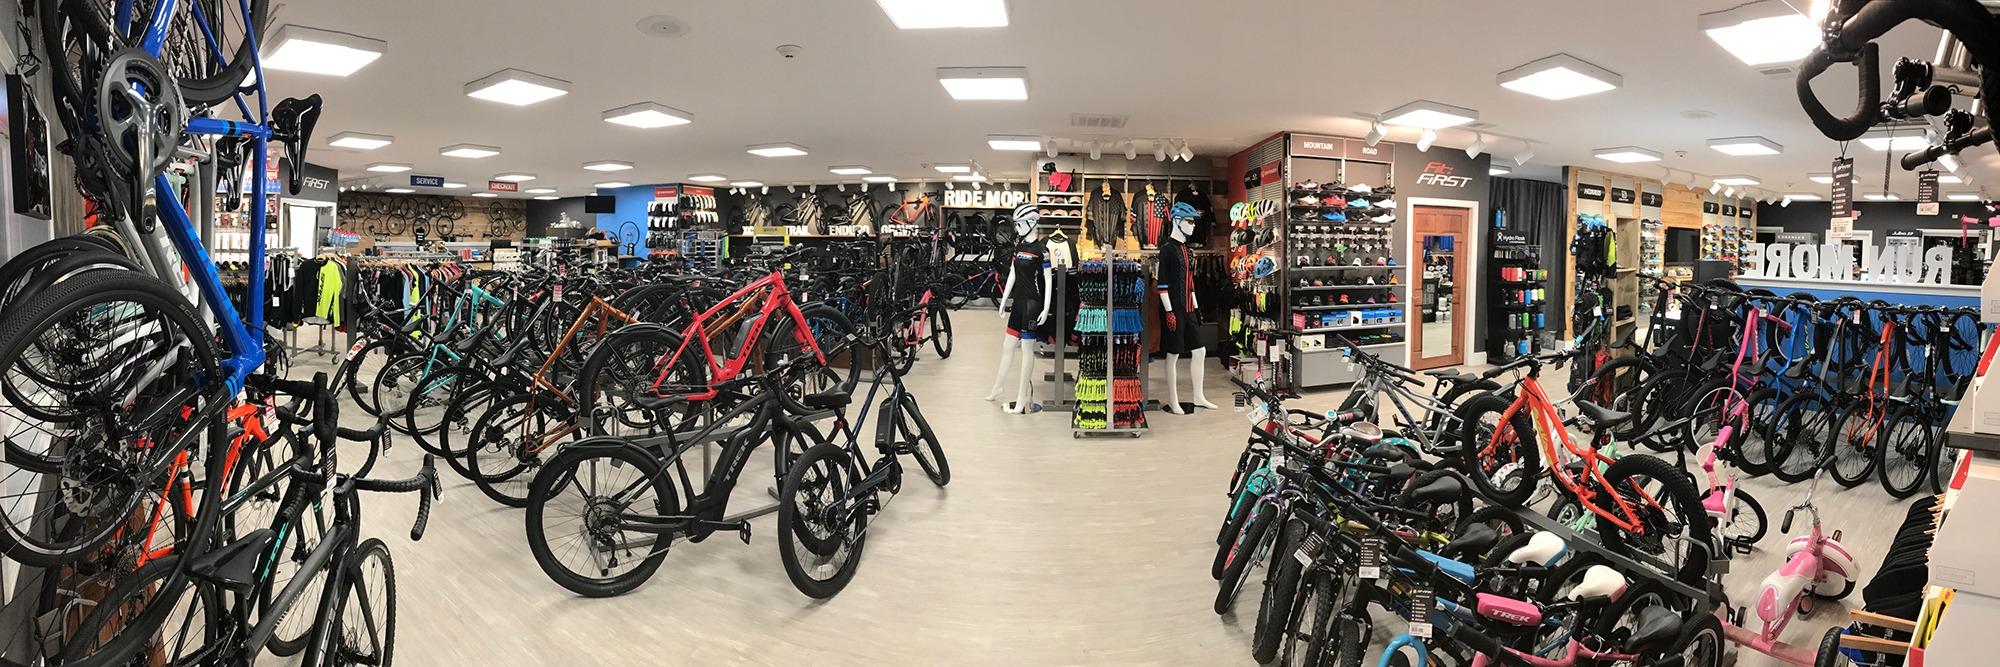 Spark Bike Run Sports shop interior